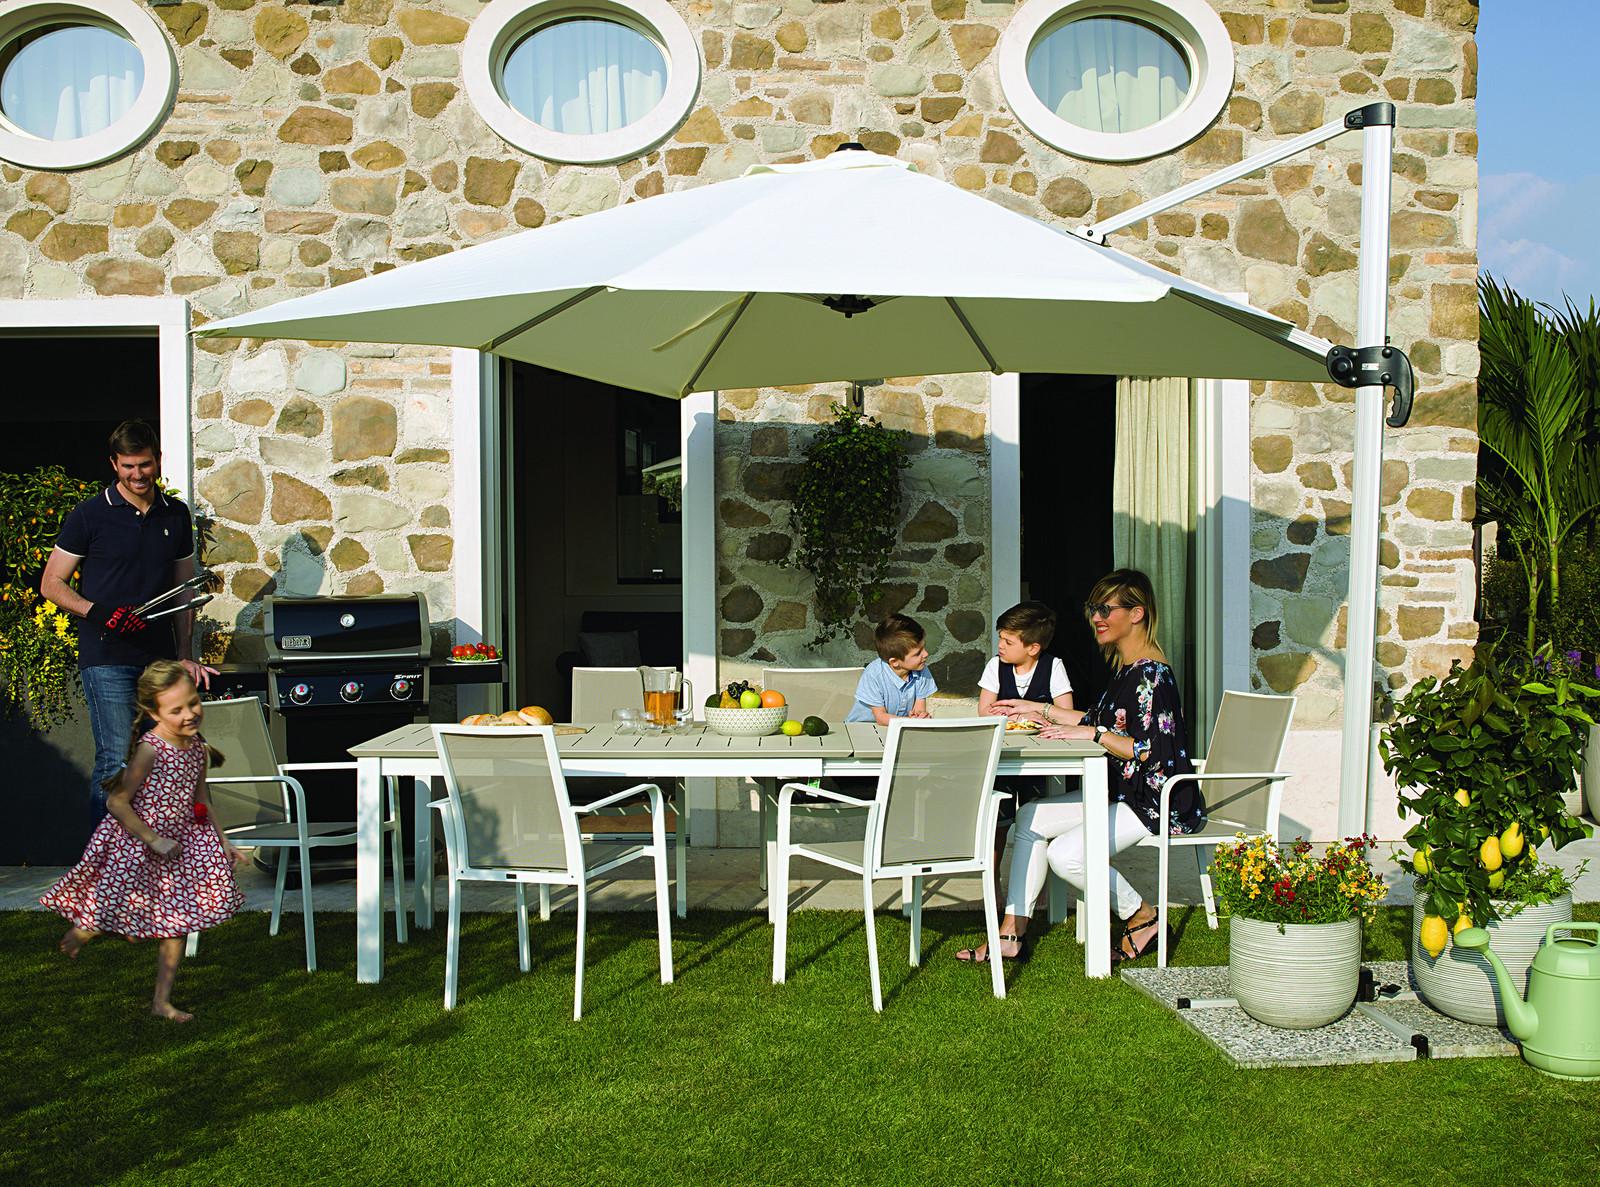 Arredo Giardino | Lombardia | Florarici Garden Store Brescia